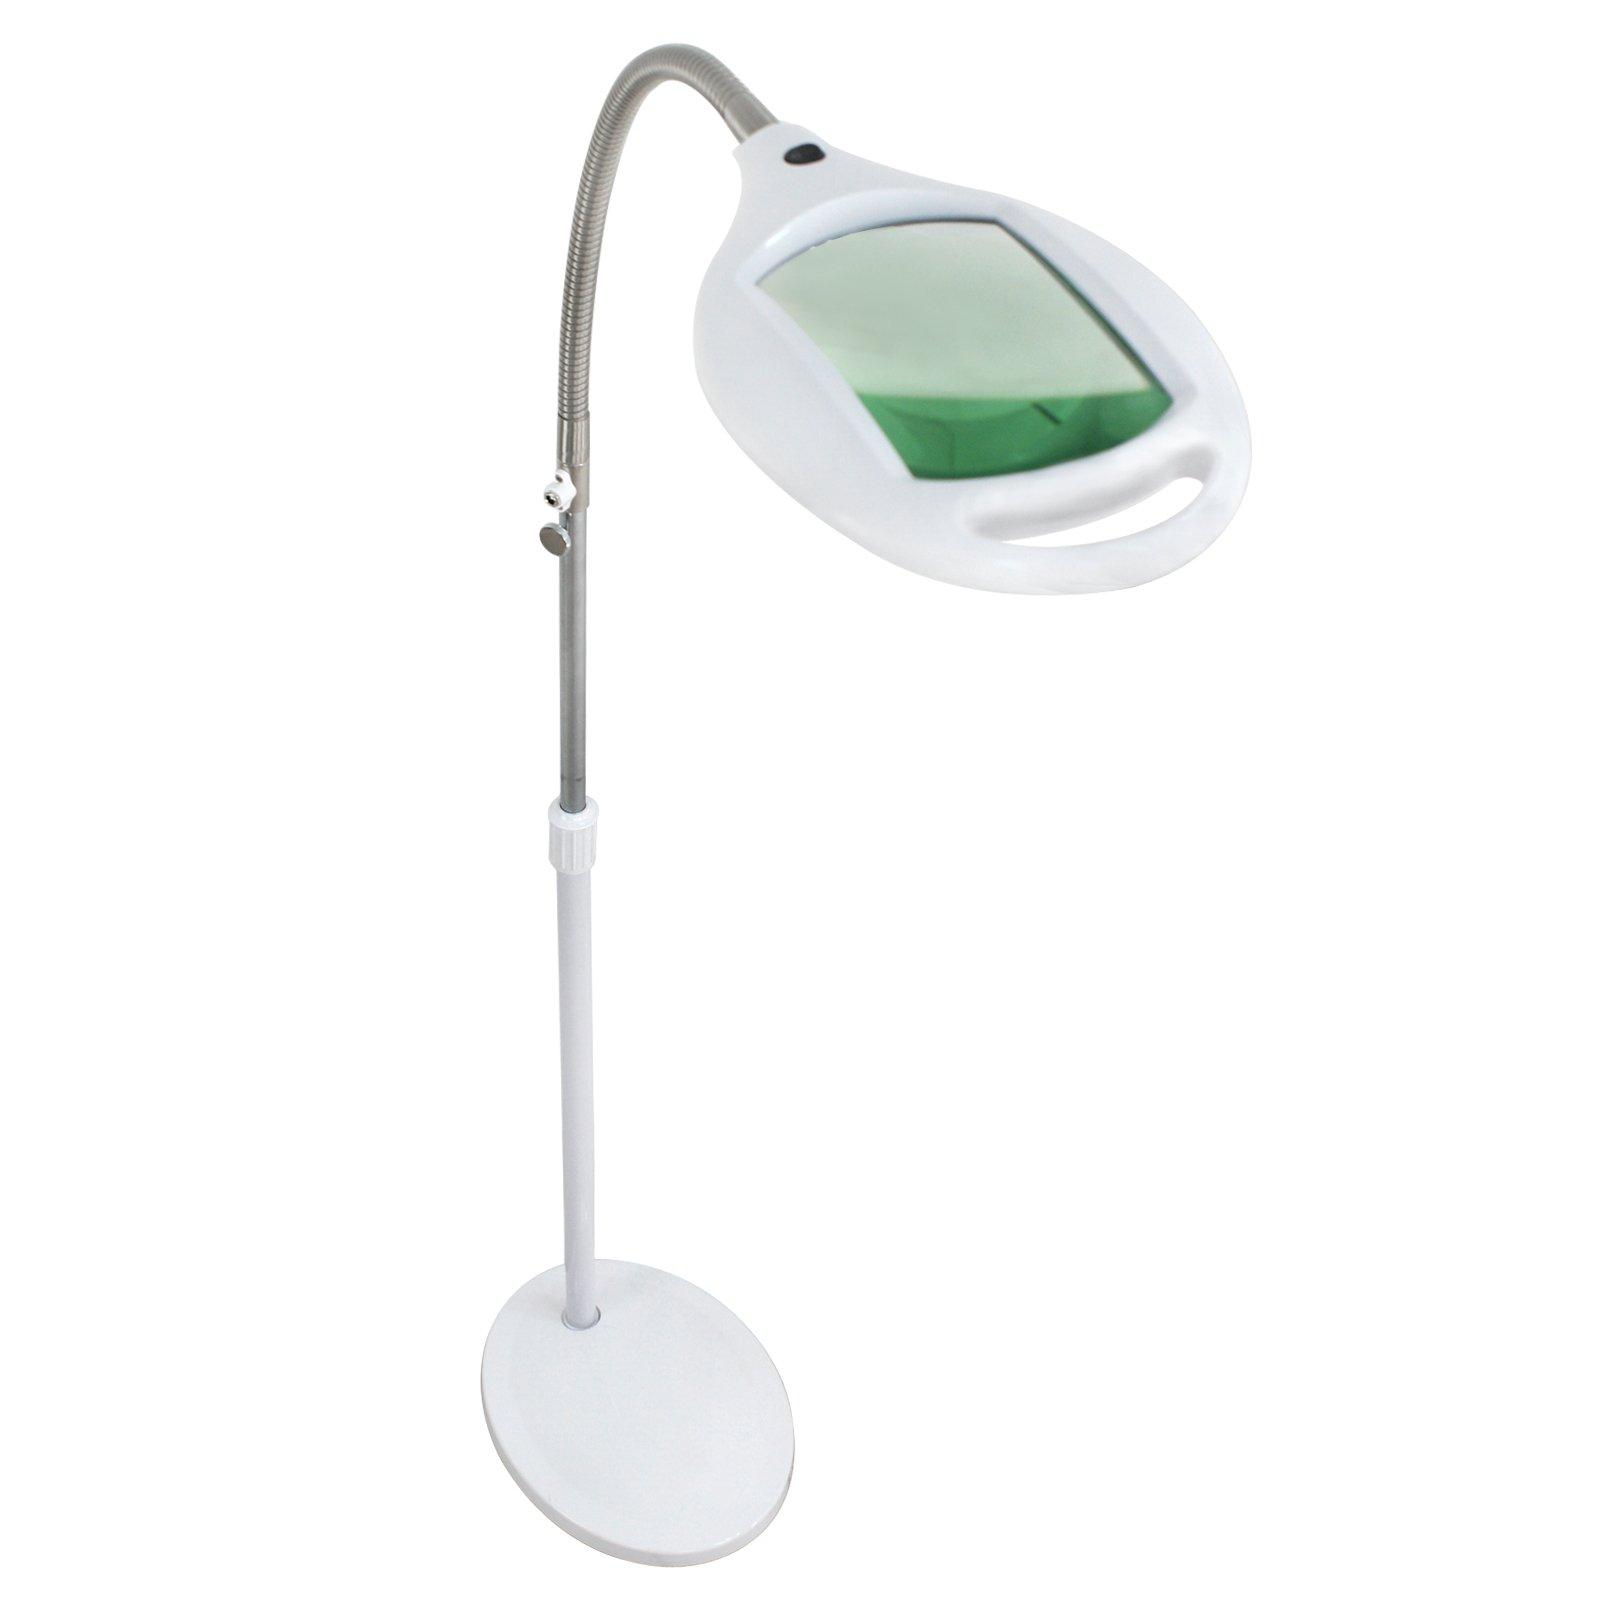 ZENY 42 LED Illuminated Magnifying Floor Lamp Light Super Bright Magnifier Lighted Glass Lens - Height Adjustable Gooseneck Energy-Saver - for Reading Task Craft Lighting